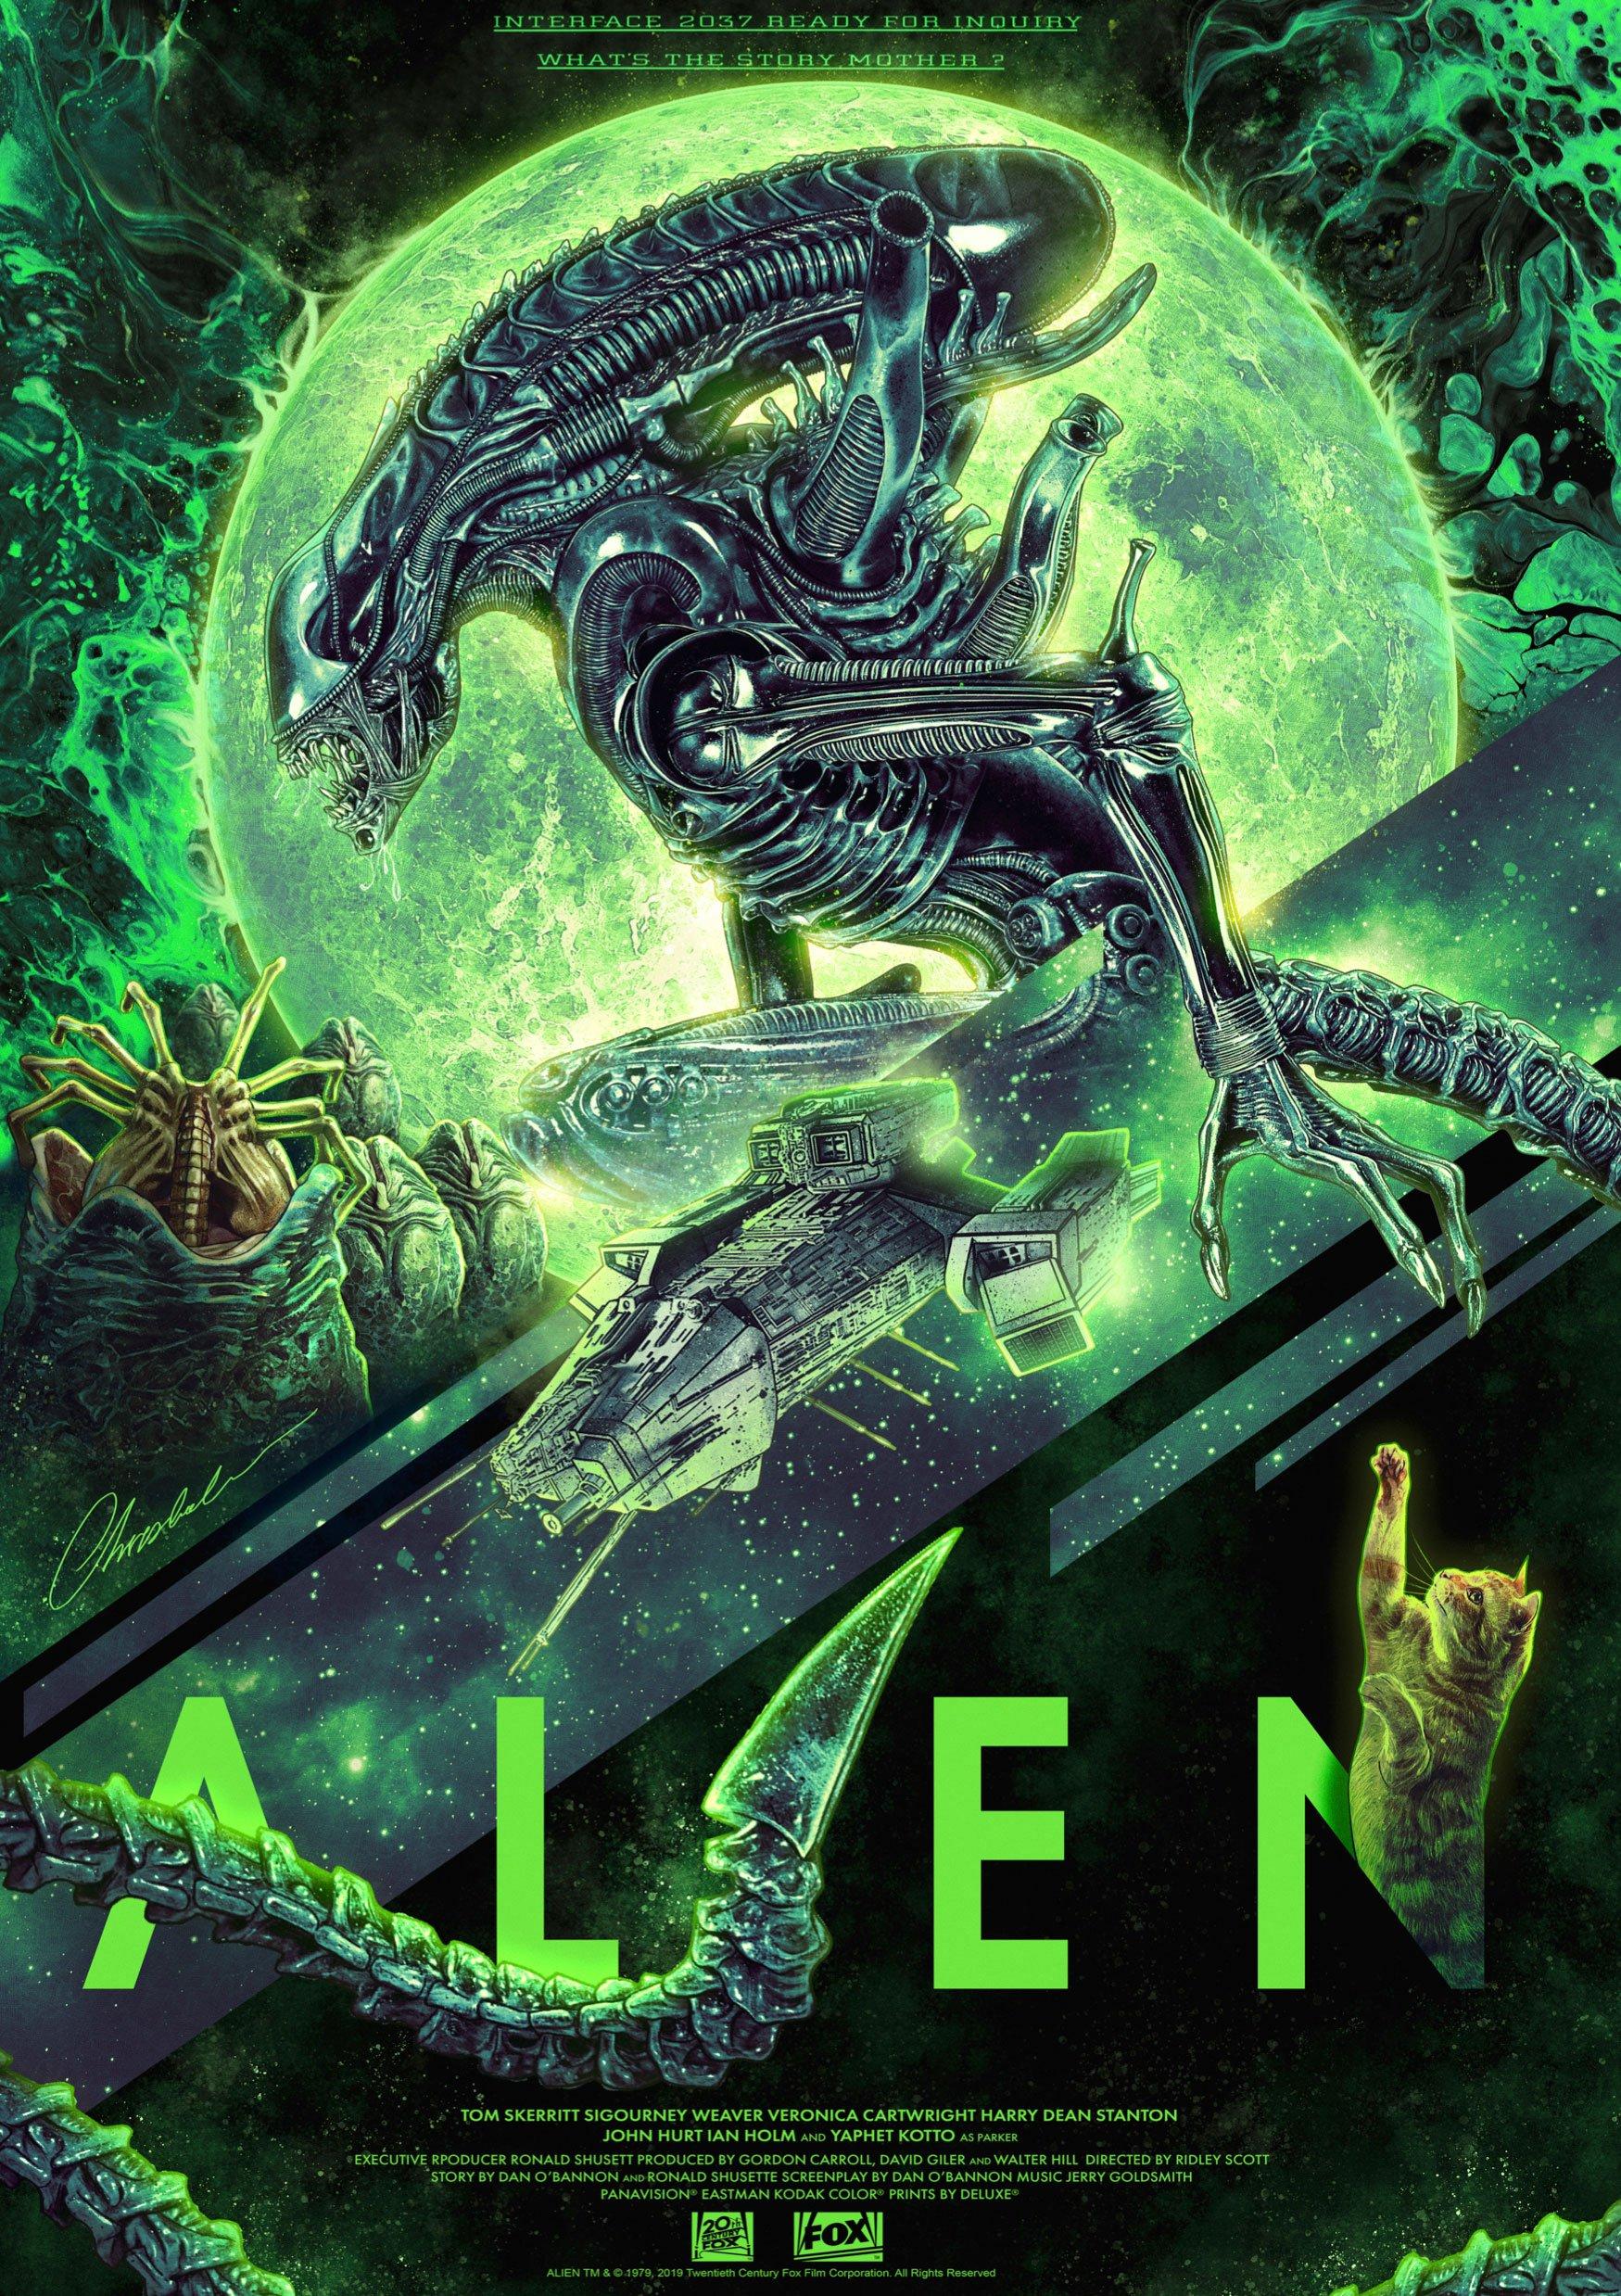 Alien Art Print Interface 2037 42 x 30 cm